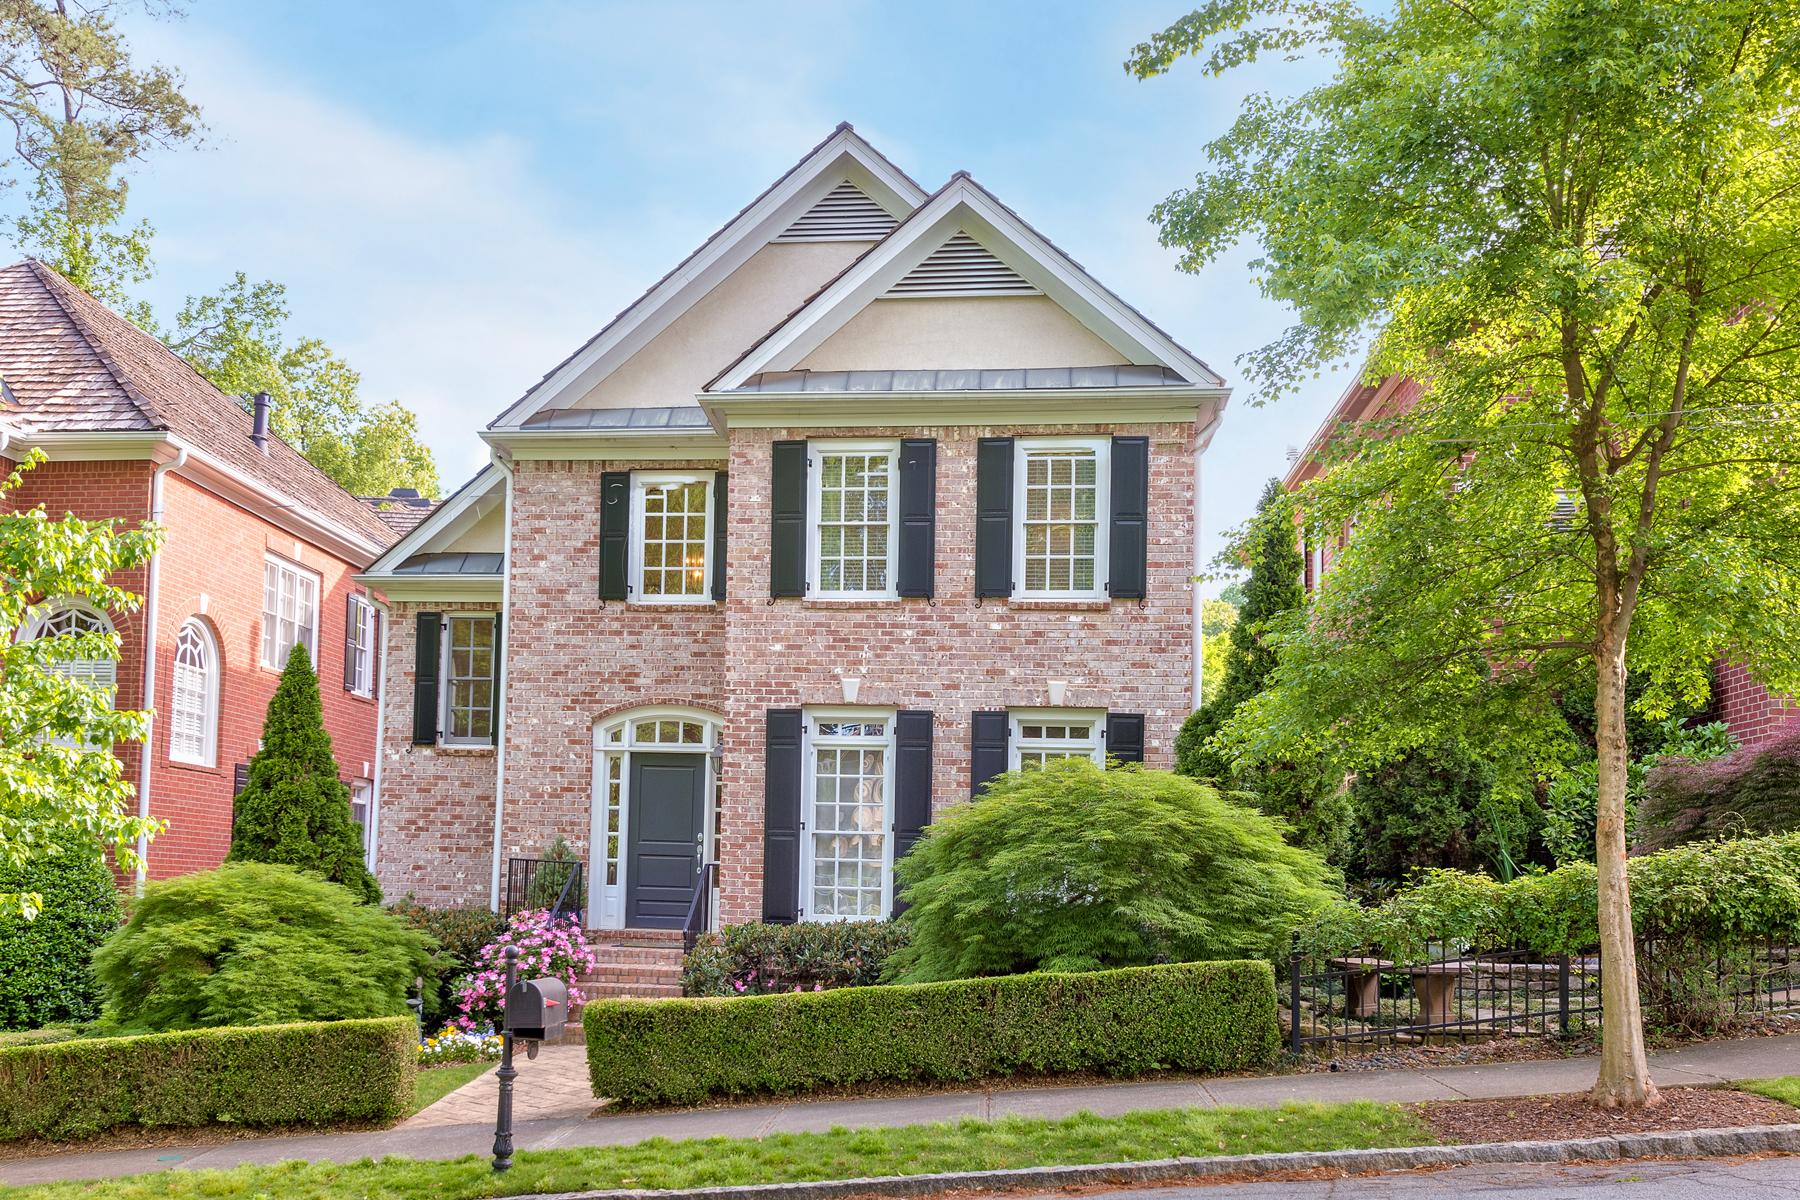 Single Family Home for Sale at Elegant Buckhead Living 704 Longleaf Dr Atlanta, Georgia, 30342 United States